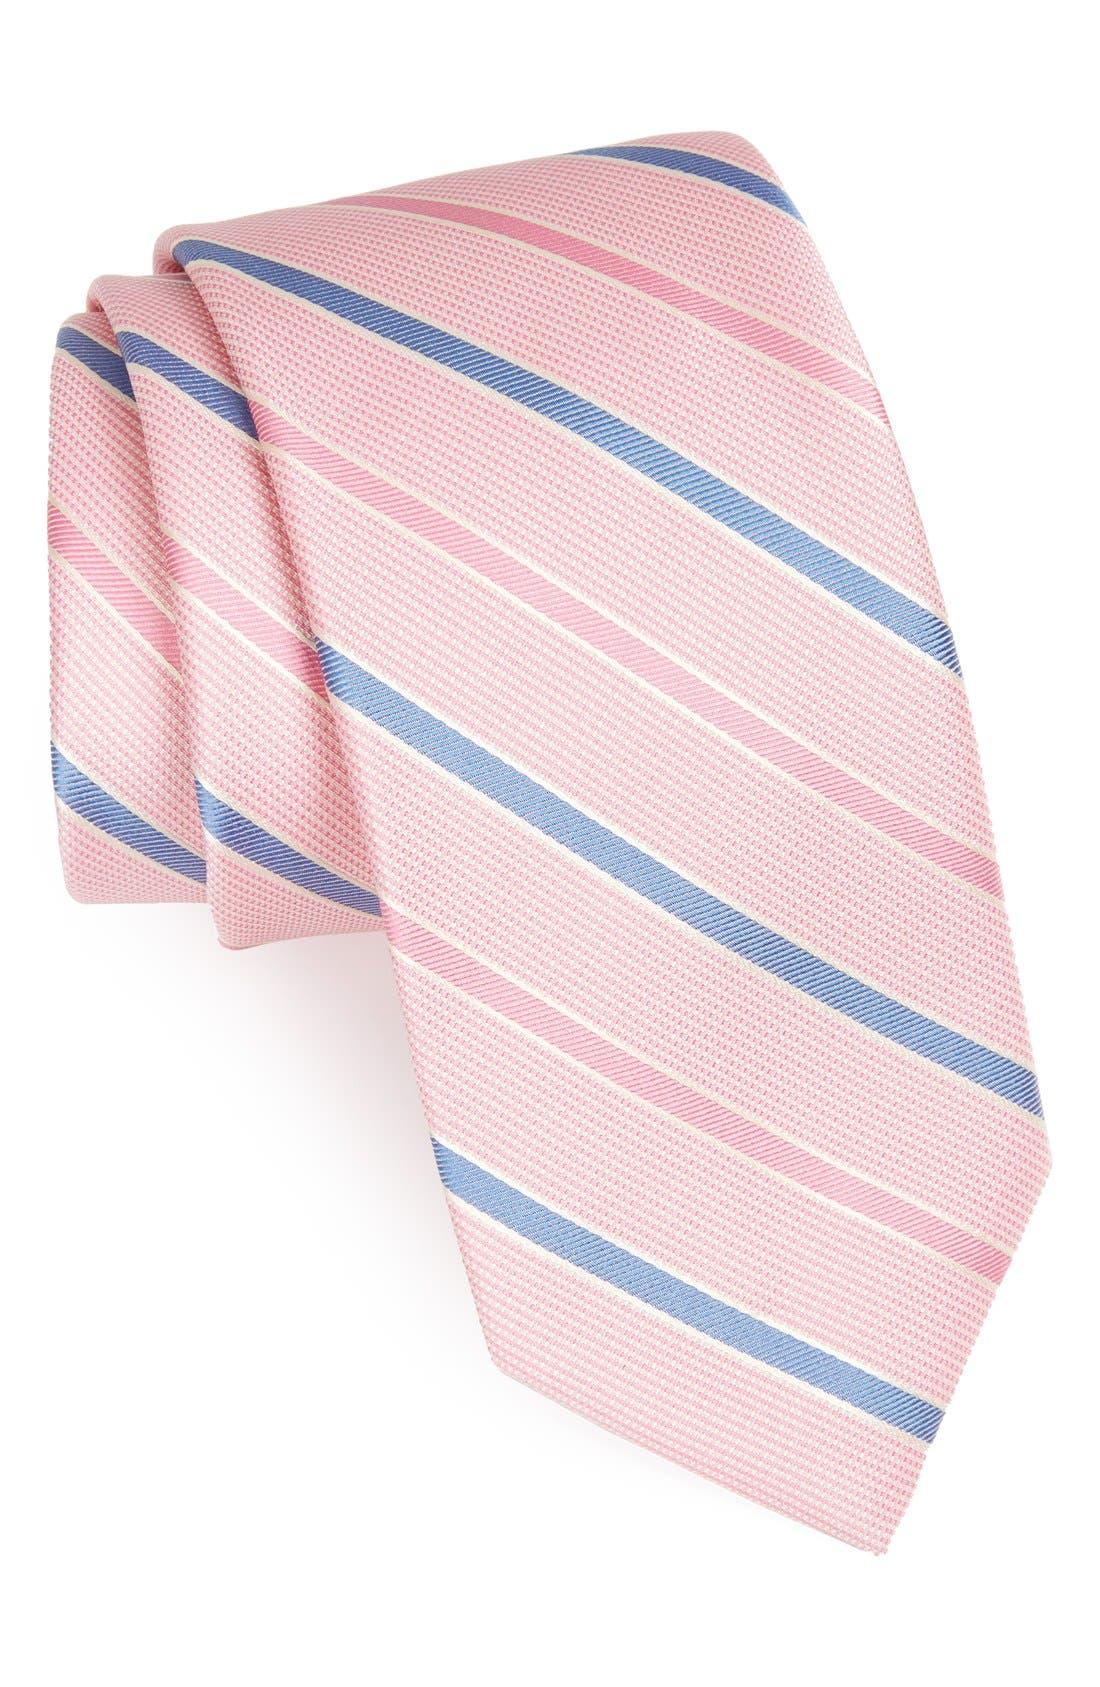 Main Image - Peter Millar Stripe Woven Silk Tie